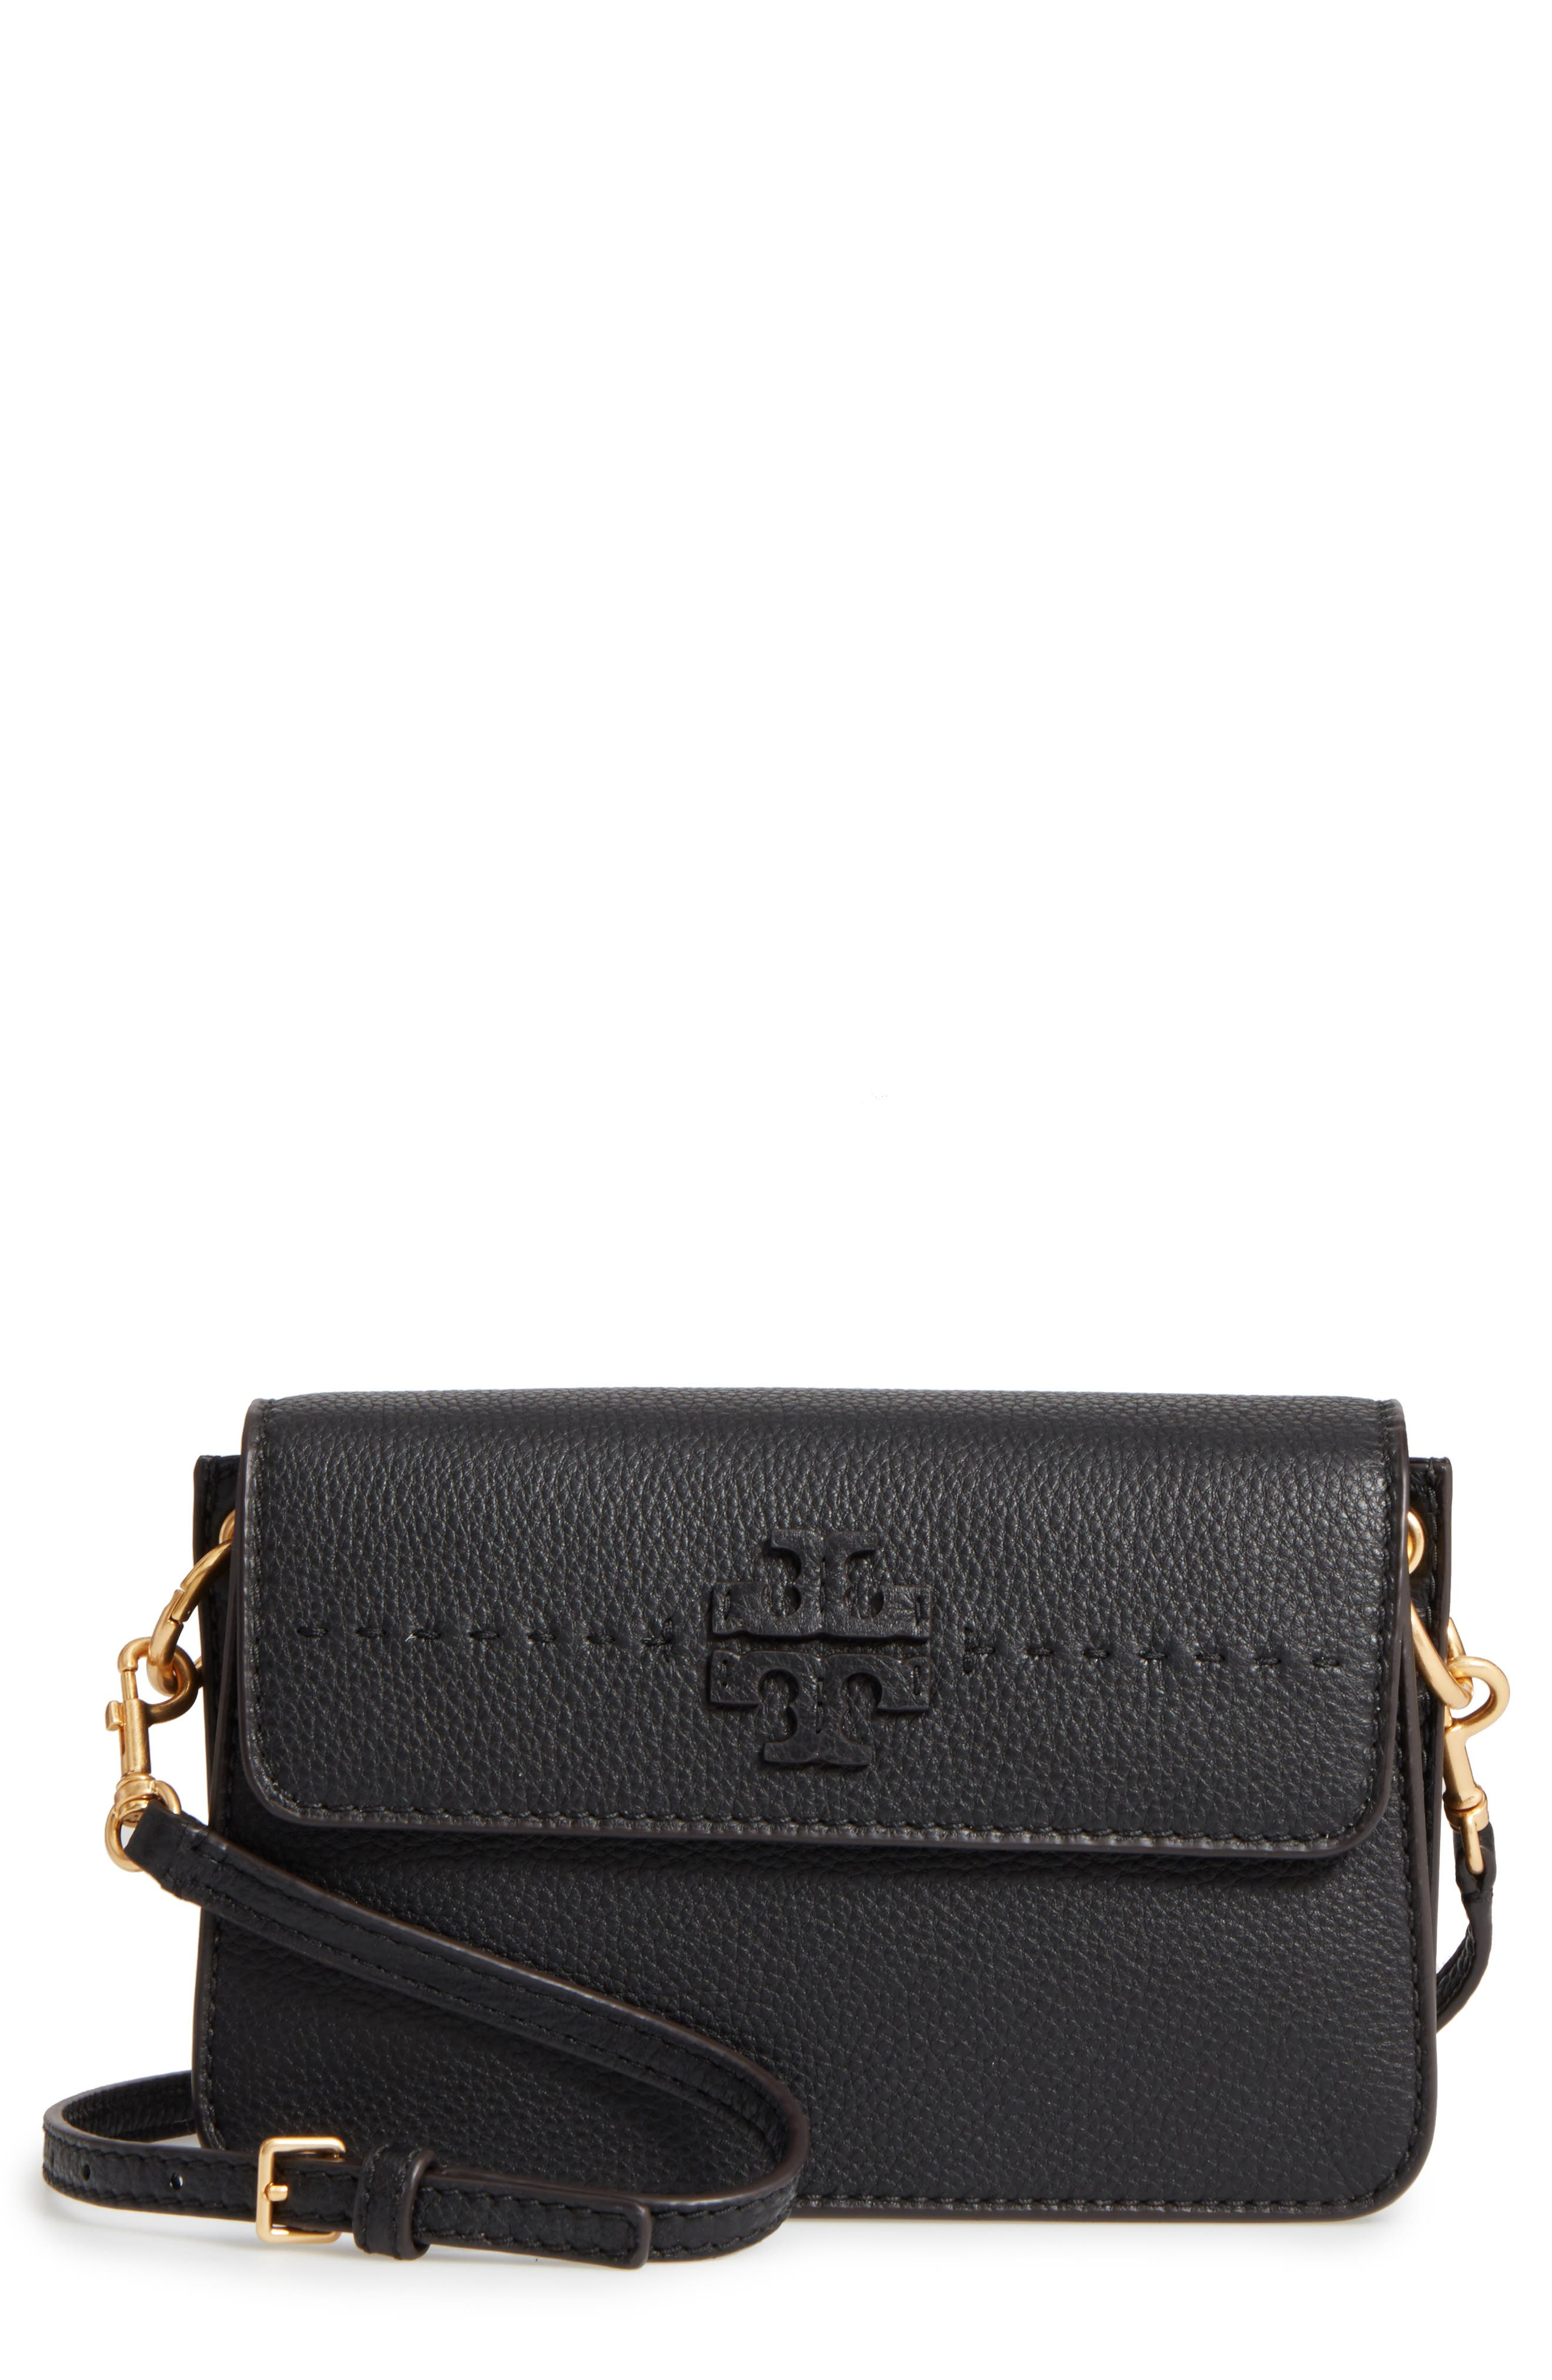 McGraw Leather Shoulder Bag,                             Main thumbnail 1, color,                             001